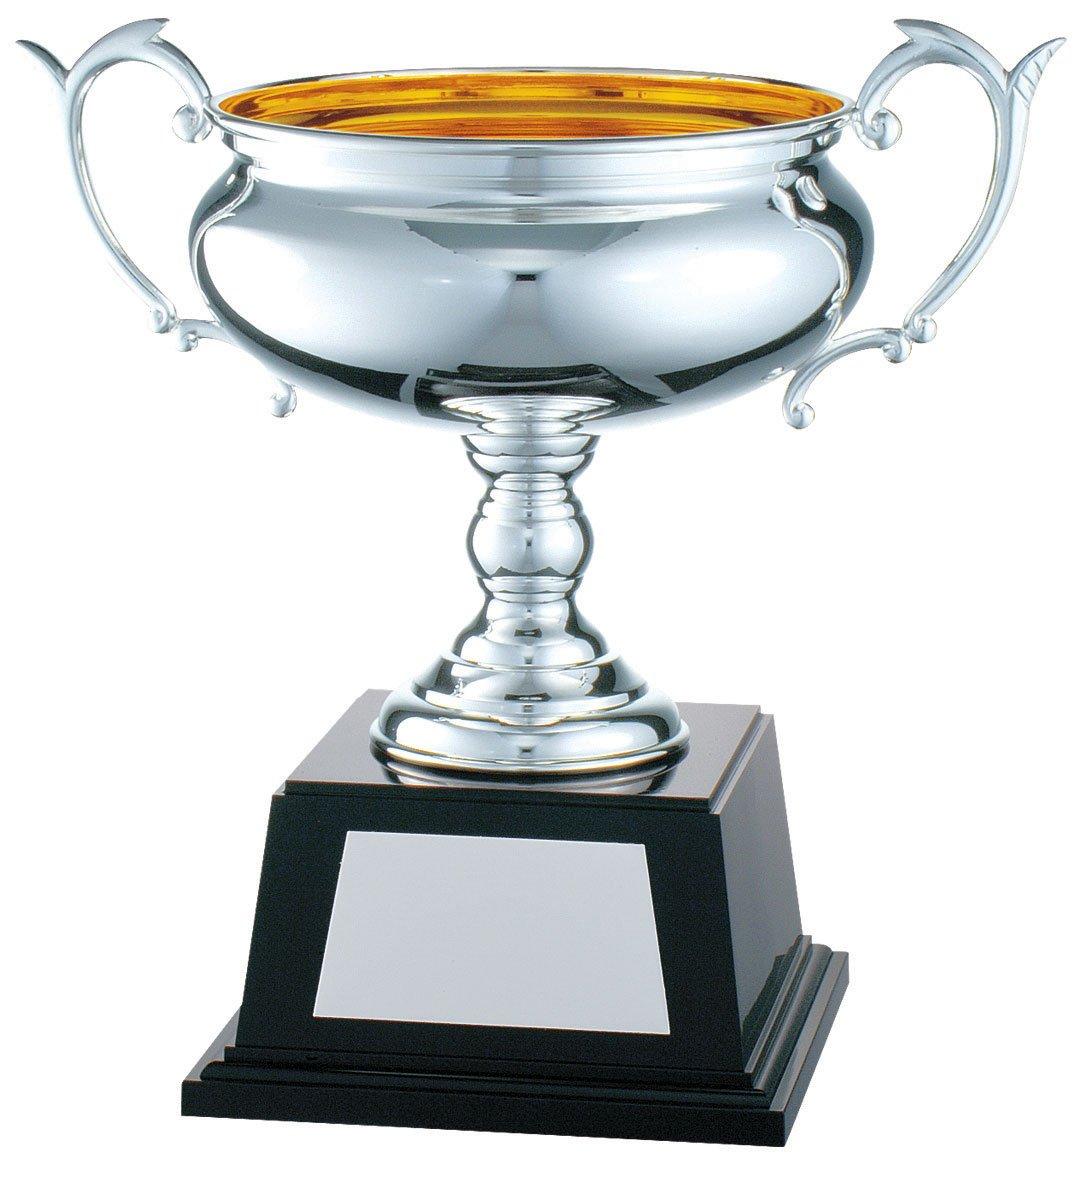 V-SHIKA ジョイカップ JC.1203 B07BQR93MY  Aサイズ